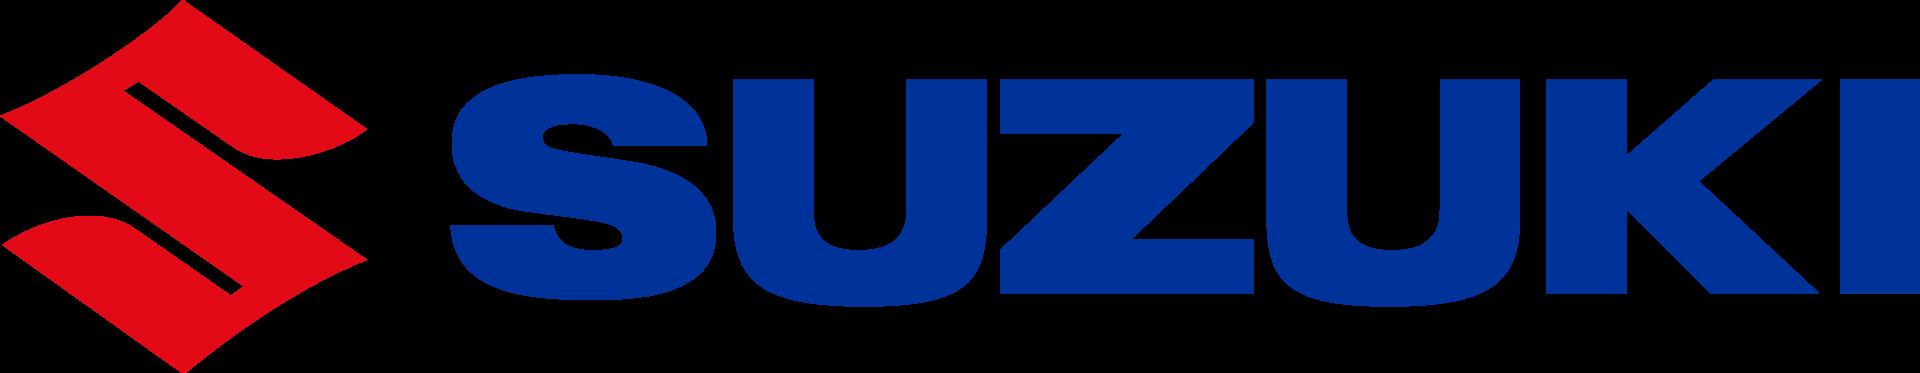 Logo de Suzuki Motors Corporation